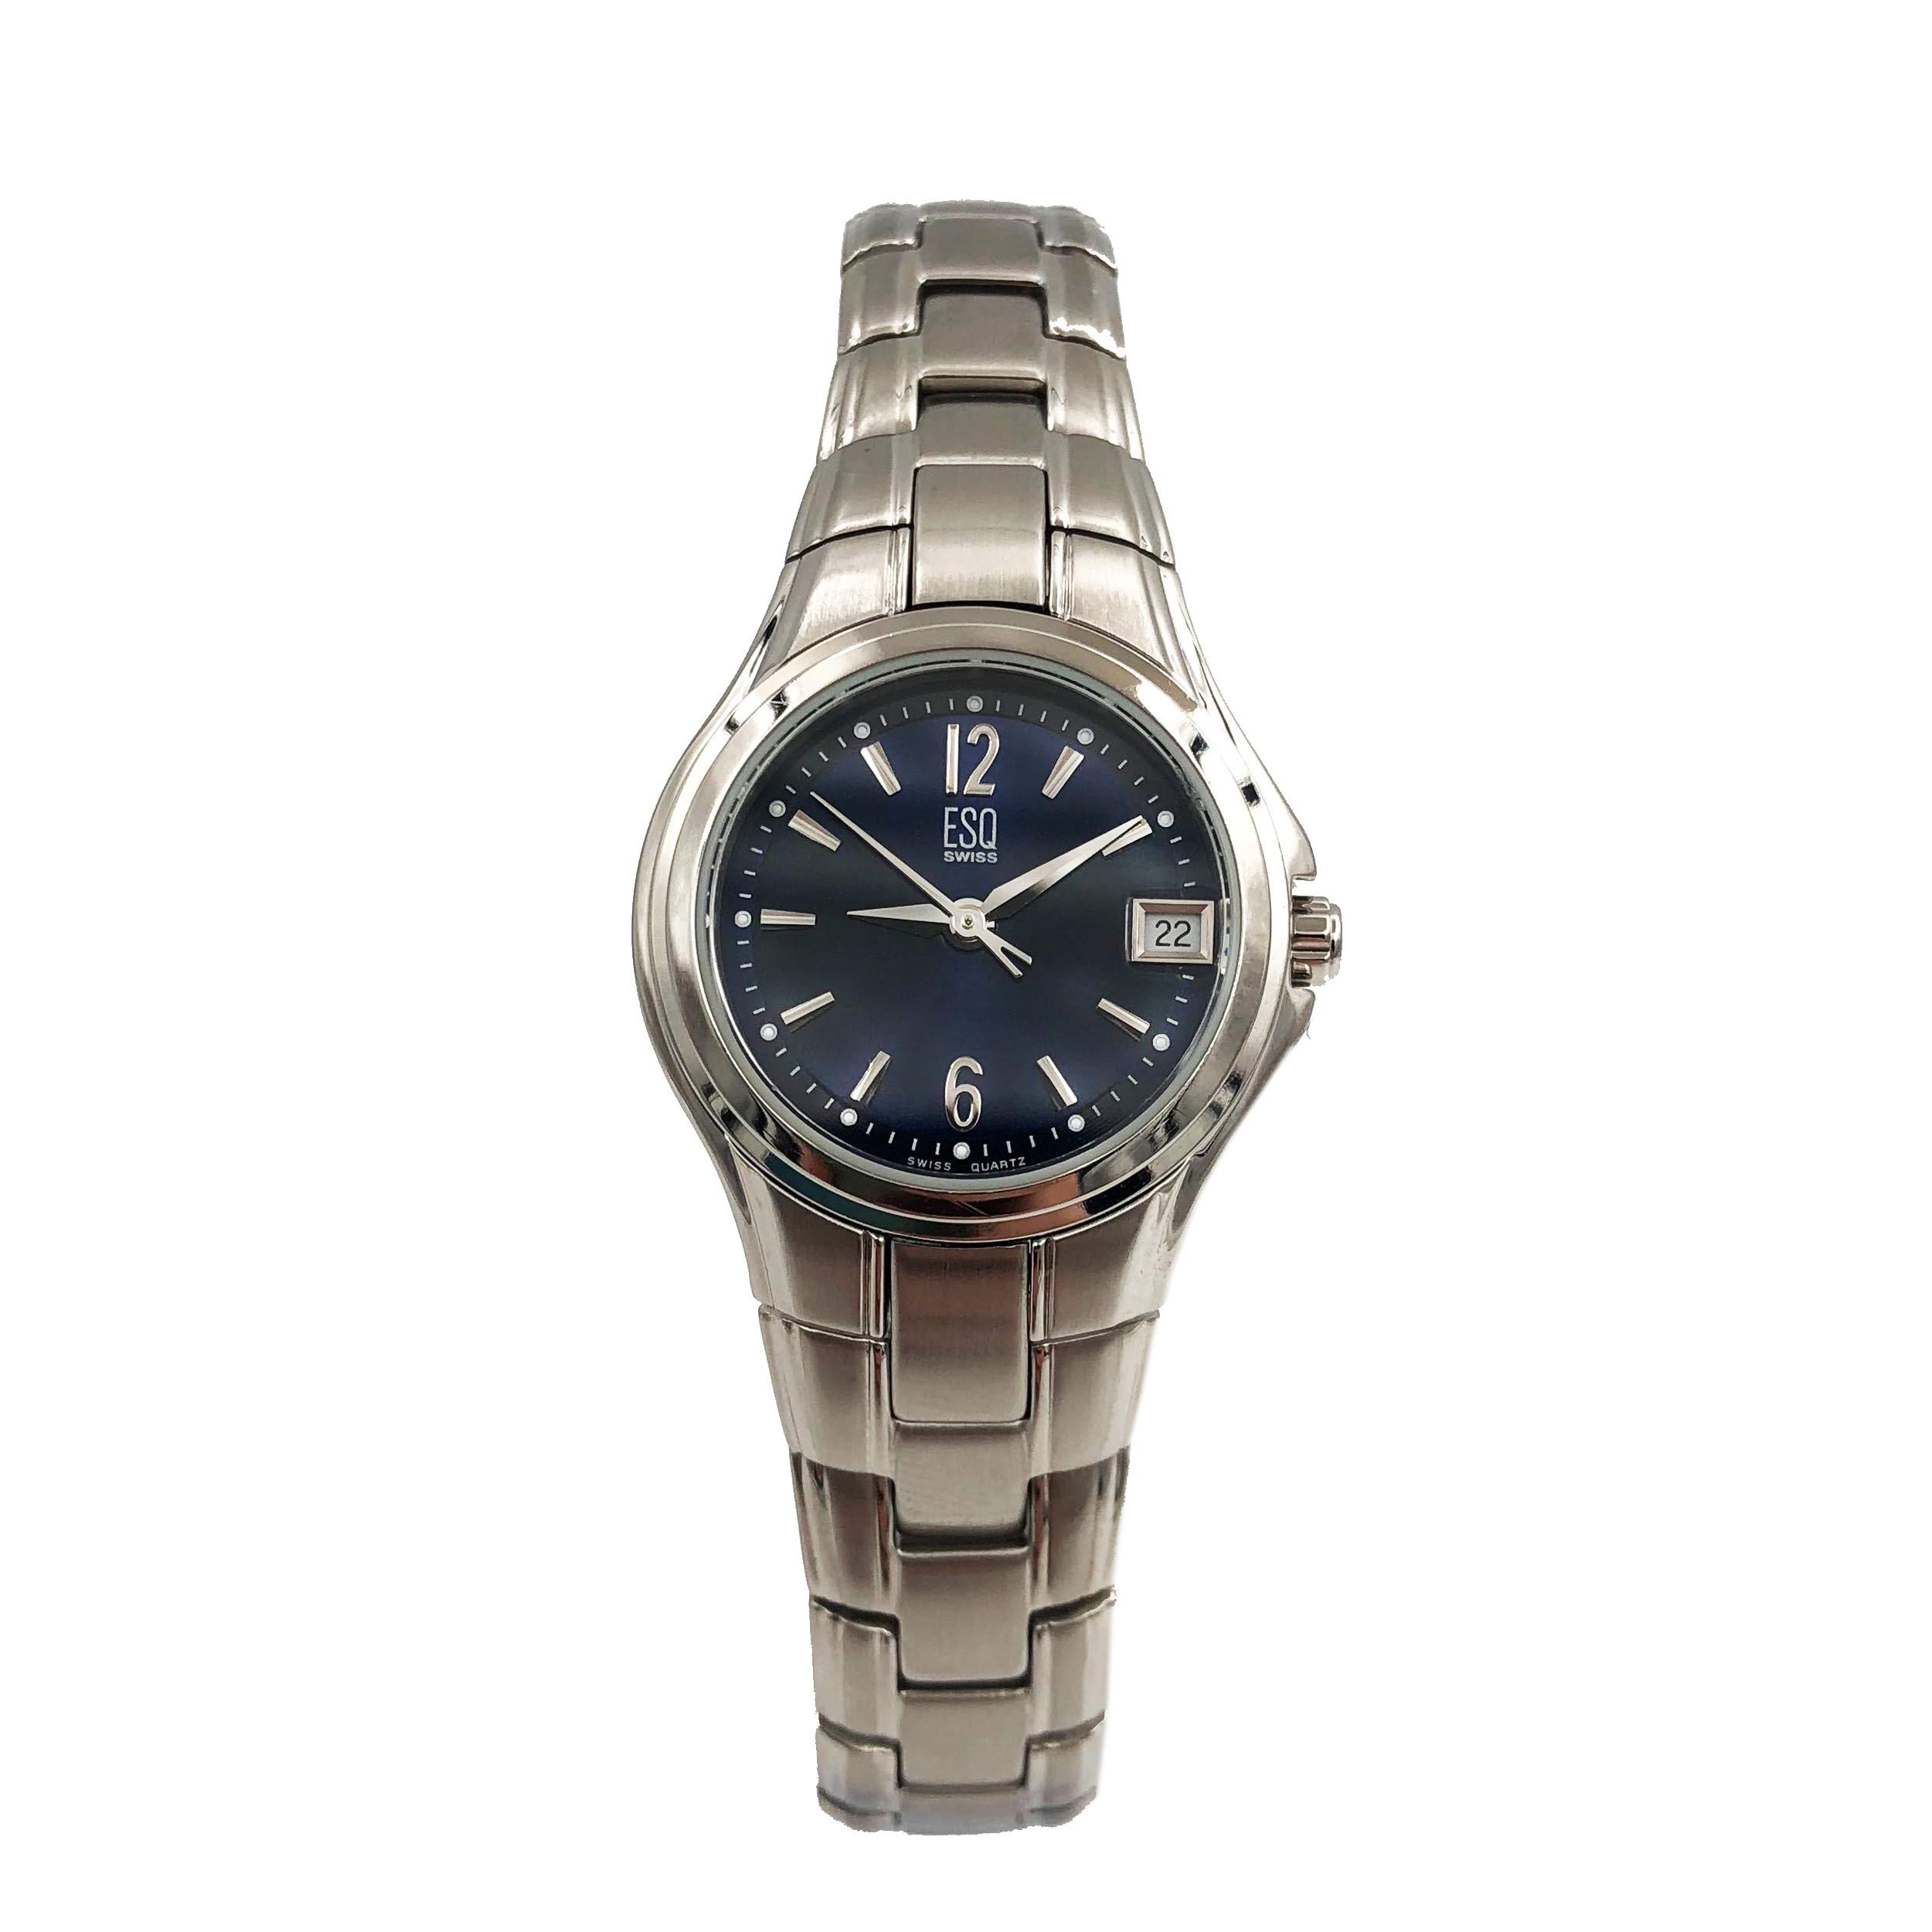 ESQ Previa Quartz Male Watch 07100951 (Certified Pre-Owned) by ESQ